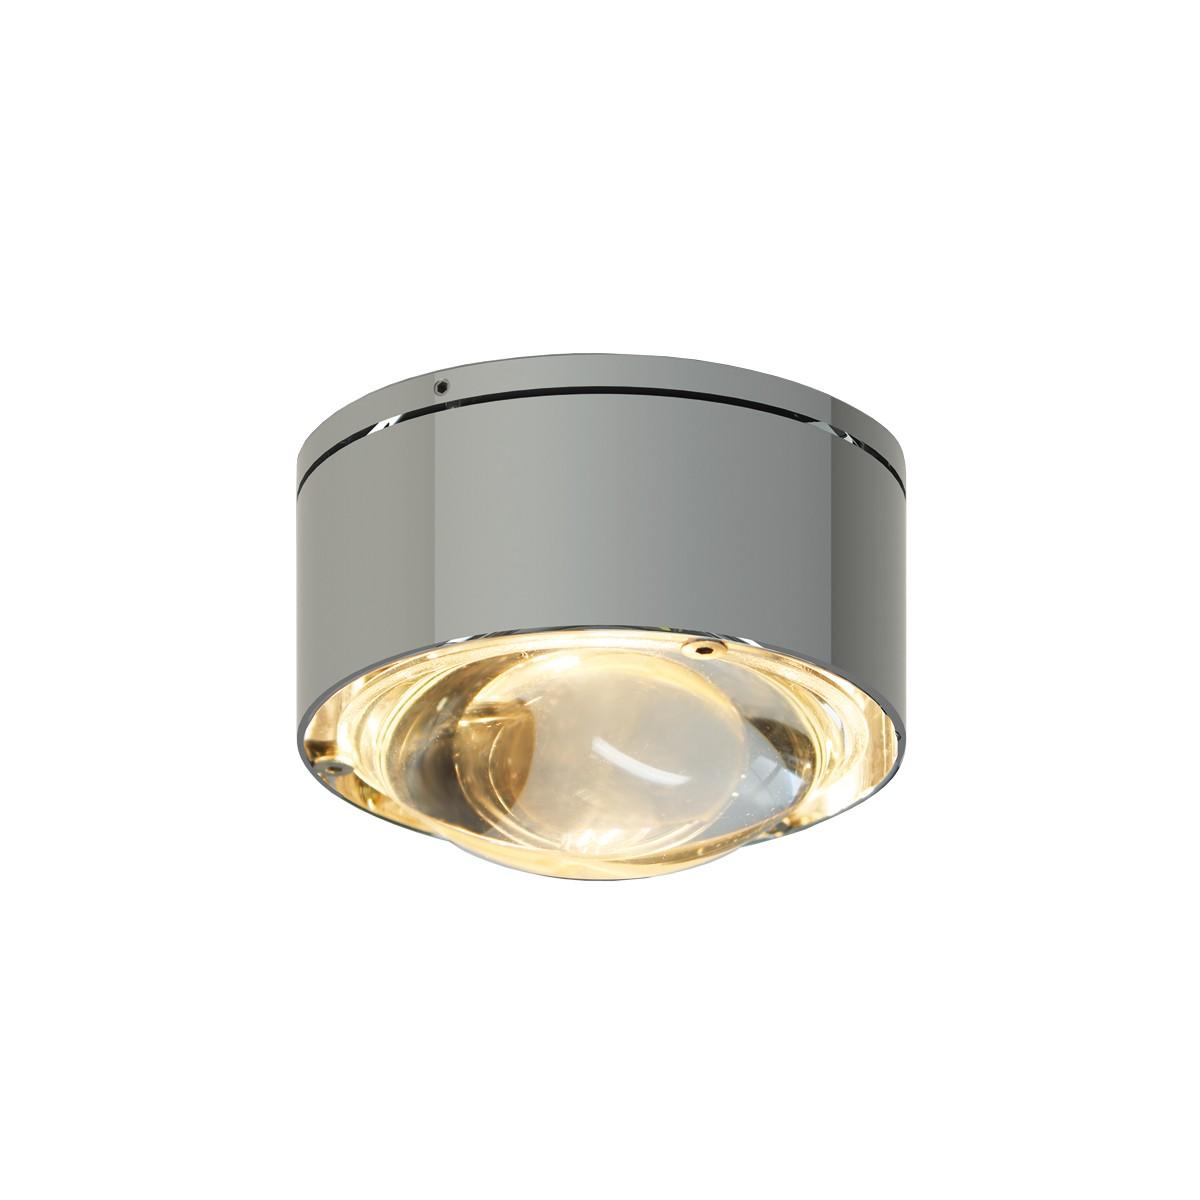 Top Light Puk One 2 LED Deckenleuchte